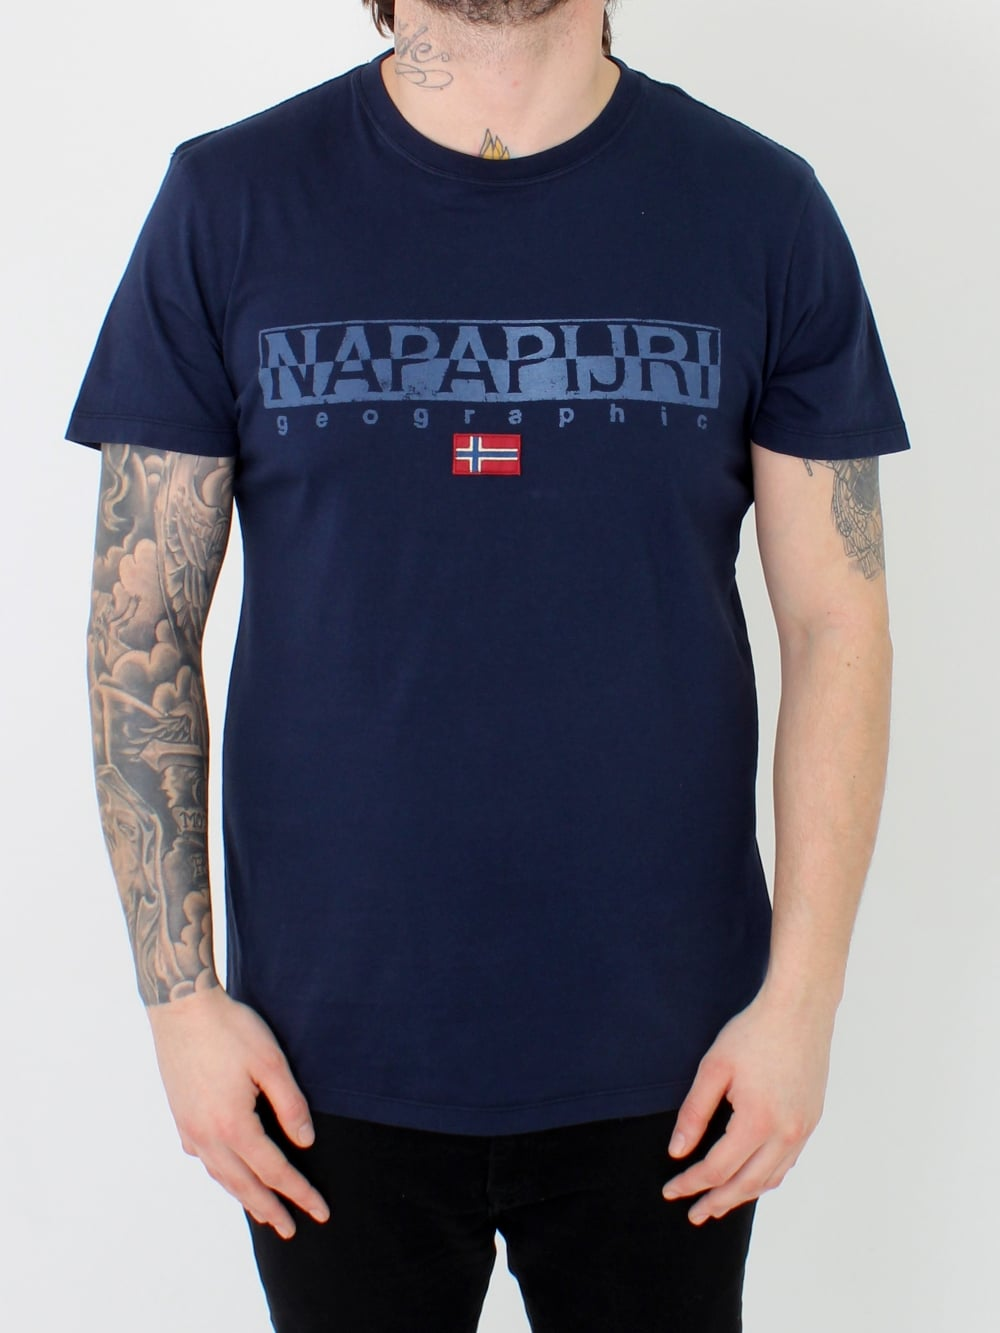 napapijri spariol 1 t shirt in marine northern threads. Black Bedroom Furniture Sets. Home Design Ideas